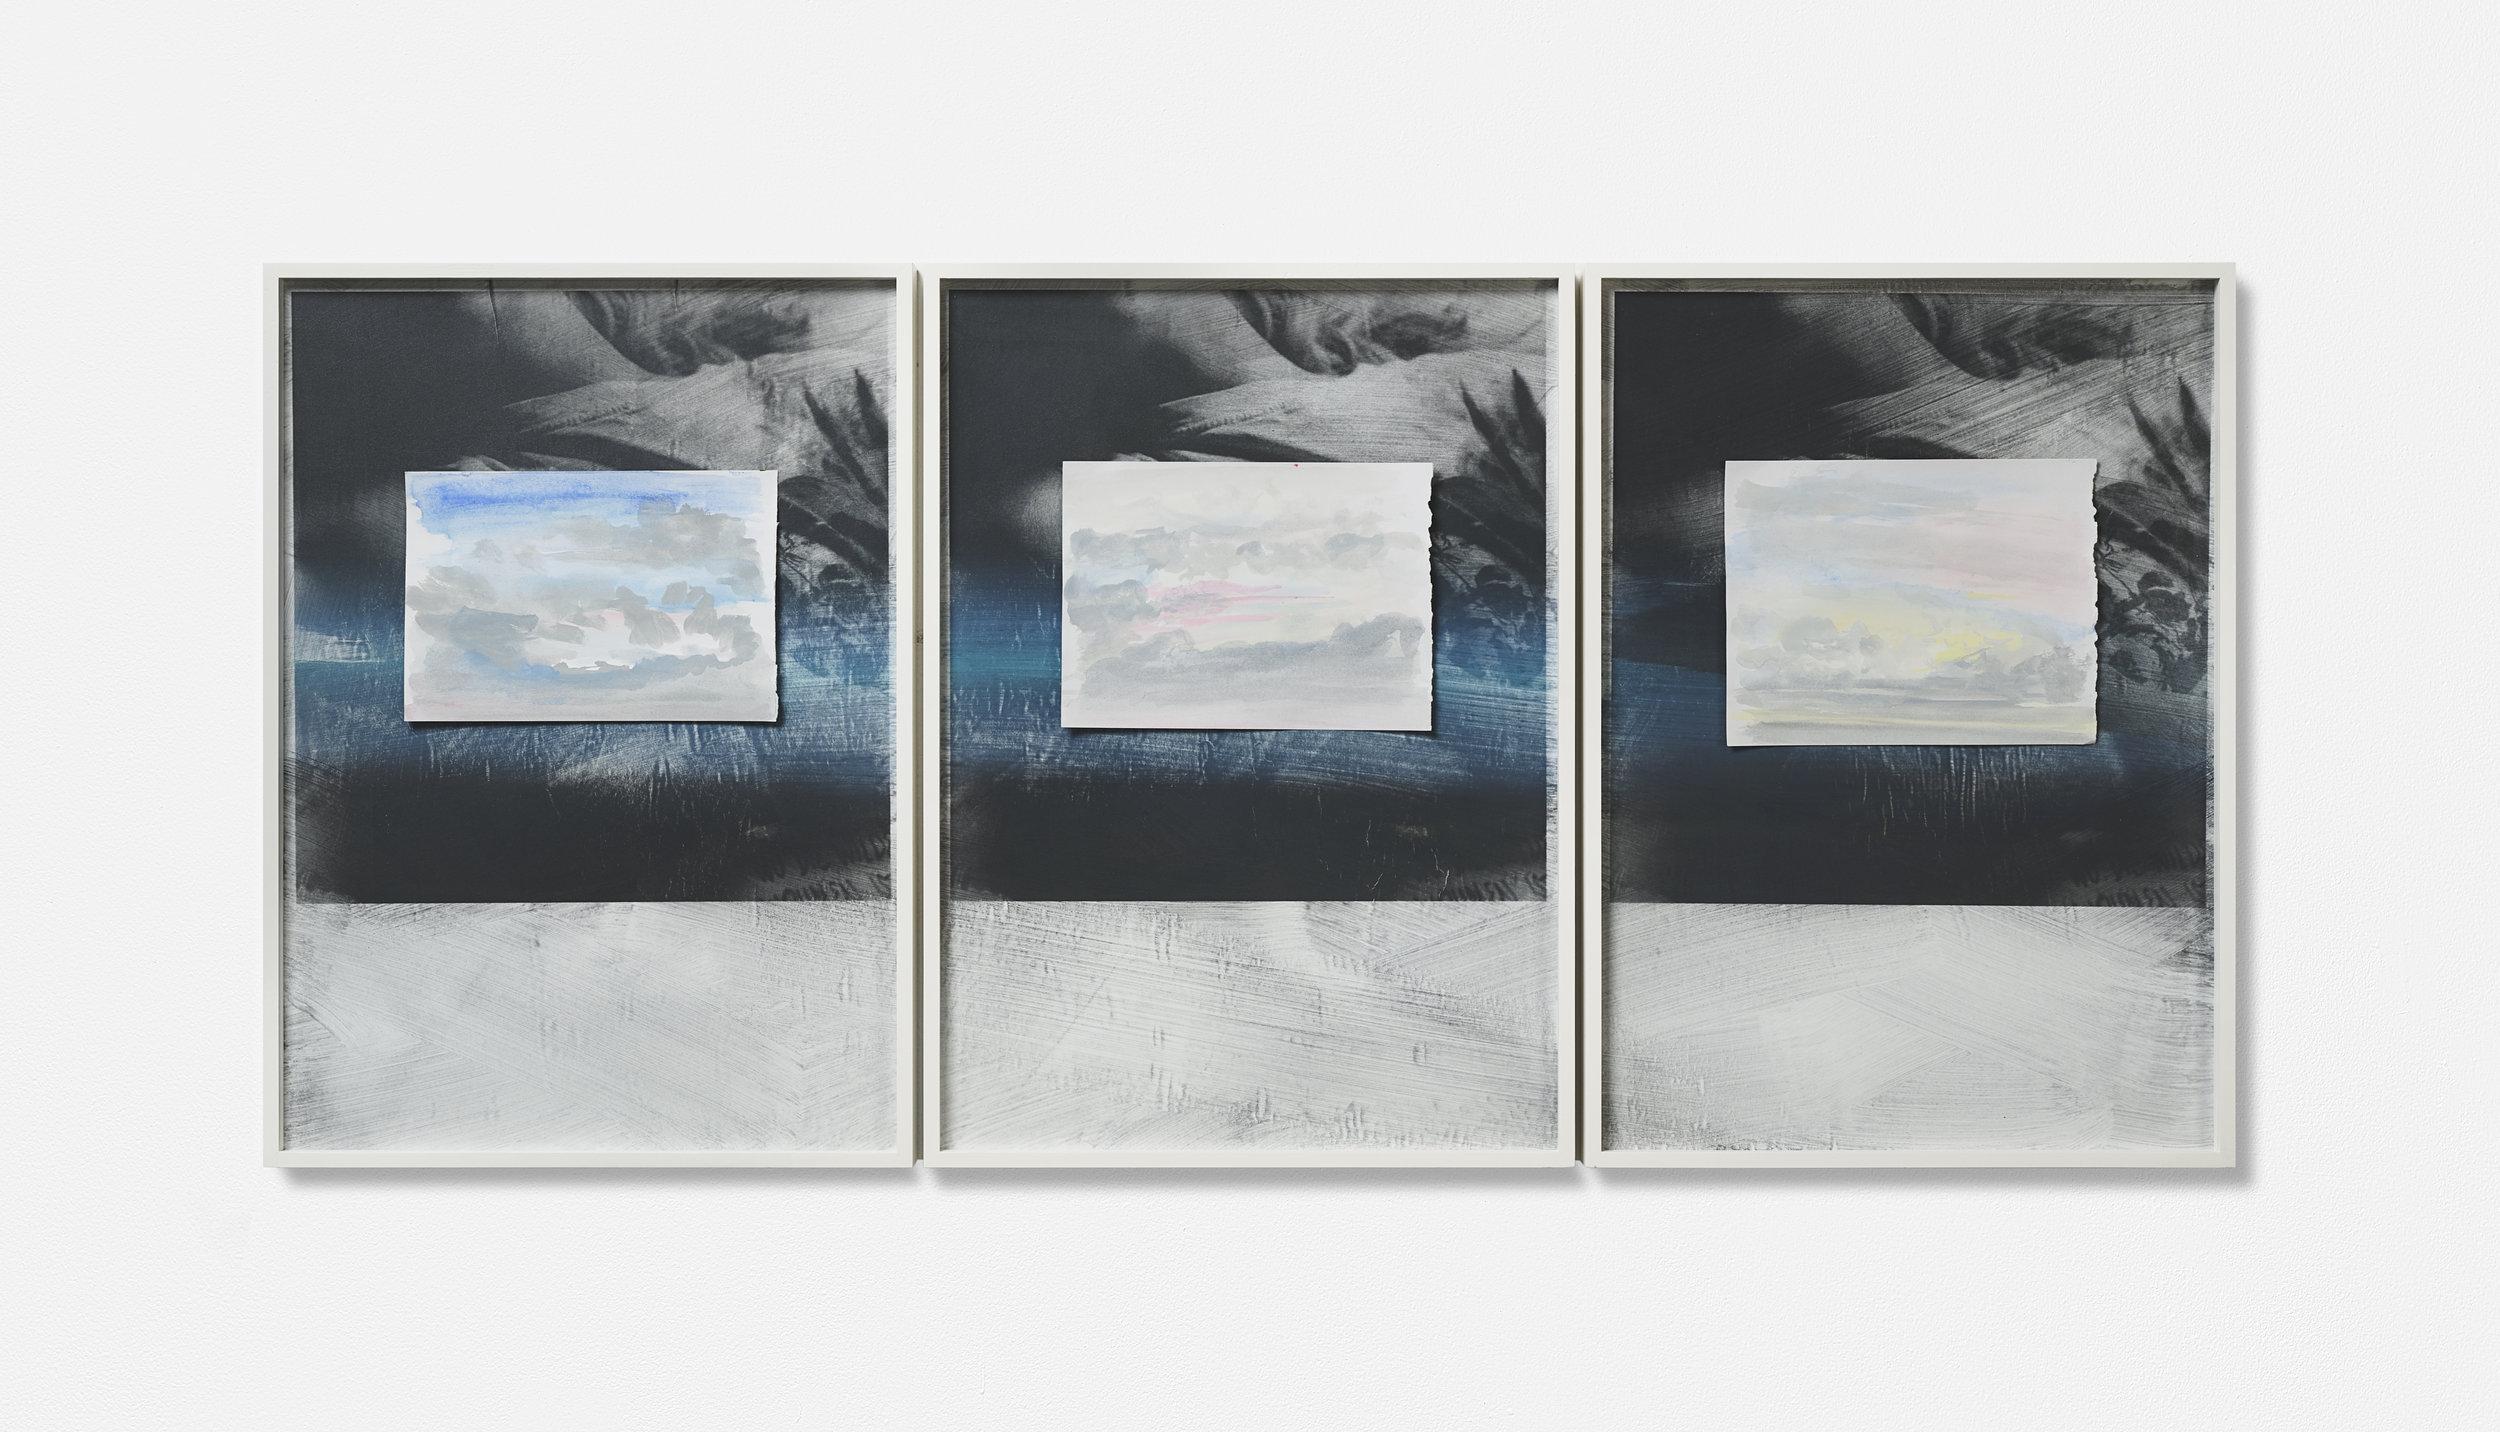 …MONT VENT TOUS / 05. / | 2002 - 2019 | Gouache Siebdruck auf Papier, Aquarellblatt, Künstlerrahmung | 133.5 x 43 x 3.5 cm | ©GALERIE ALBER